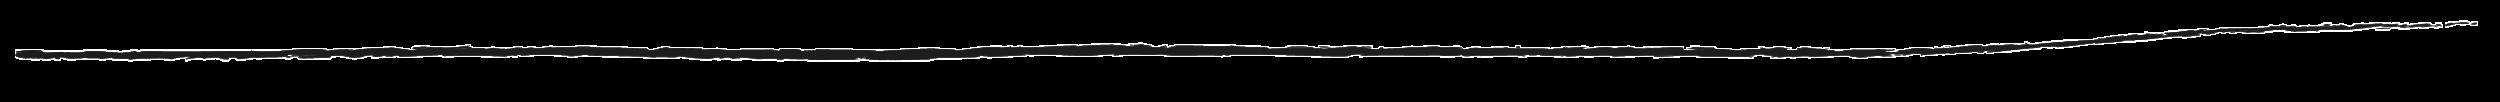 Line-10-02.png